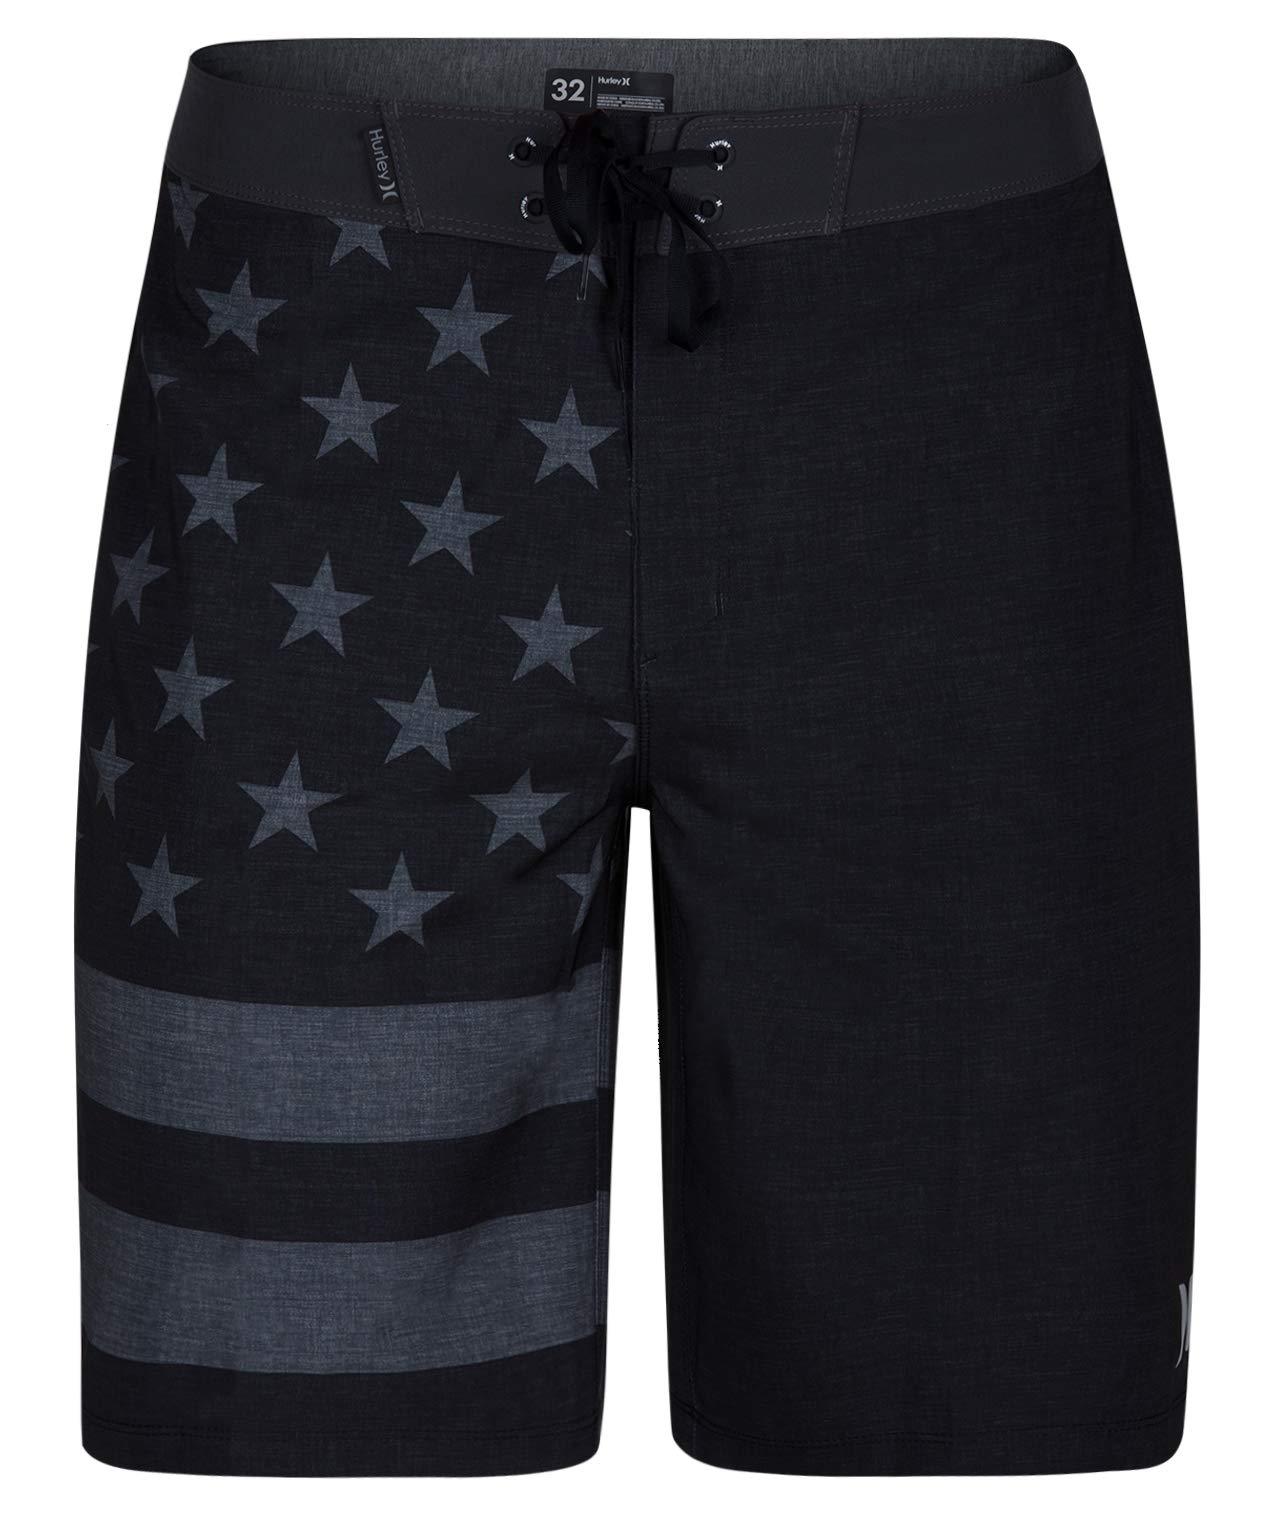 Hurley Apparel Phantom Boardshort Swimwear